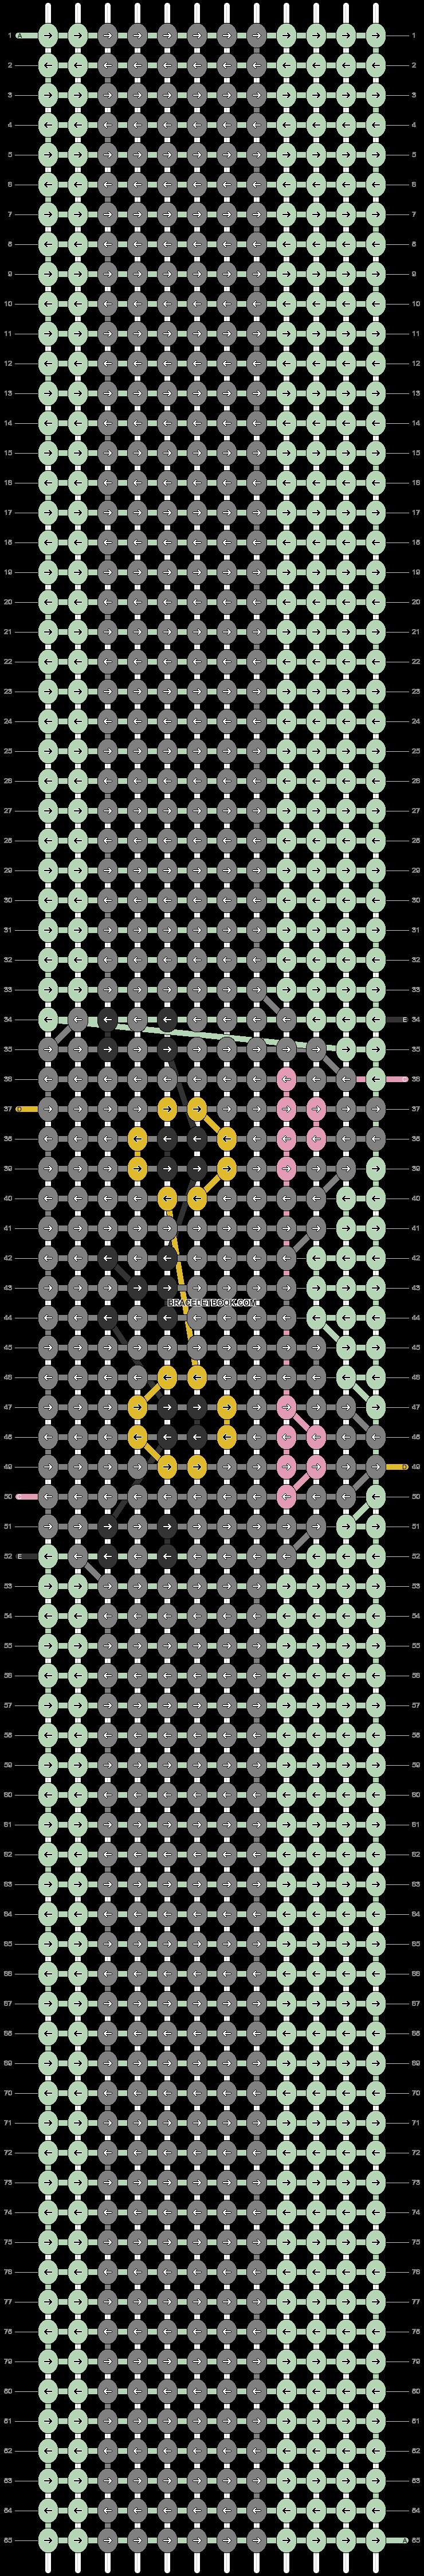 Alpha pattern #89842 variation #162599 pattern